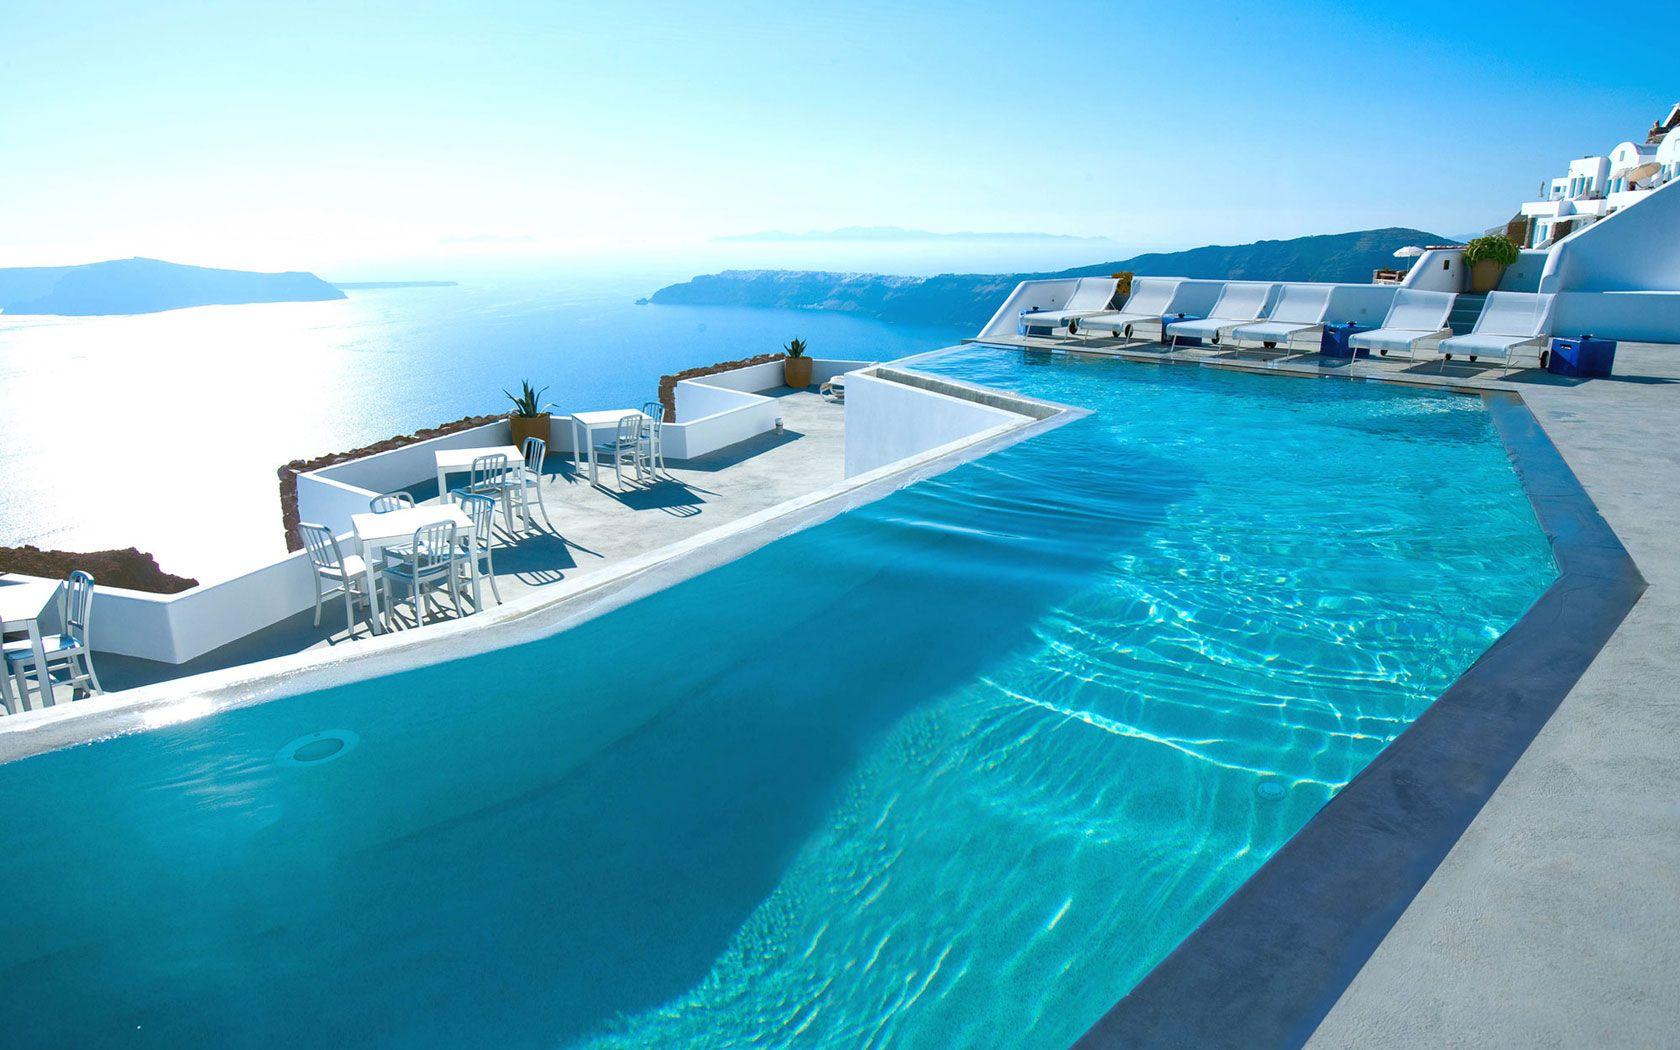 Santorini Pool Hd Background Wallpaper Amazing Swimming Pools Santorini Hotels Beautiful Pools Amazing swimming pool wallpaper